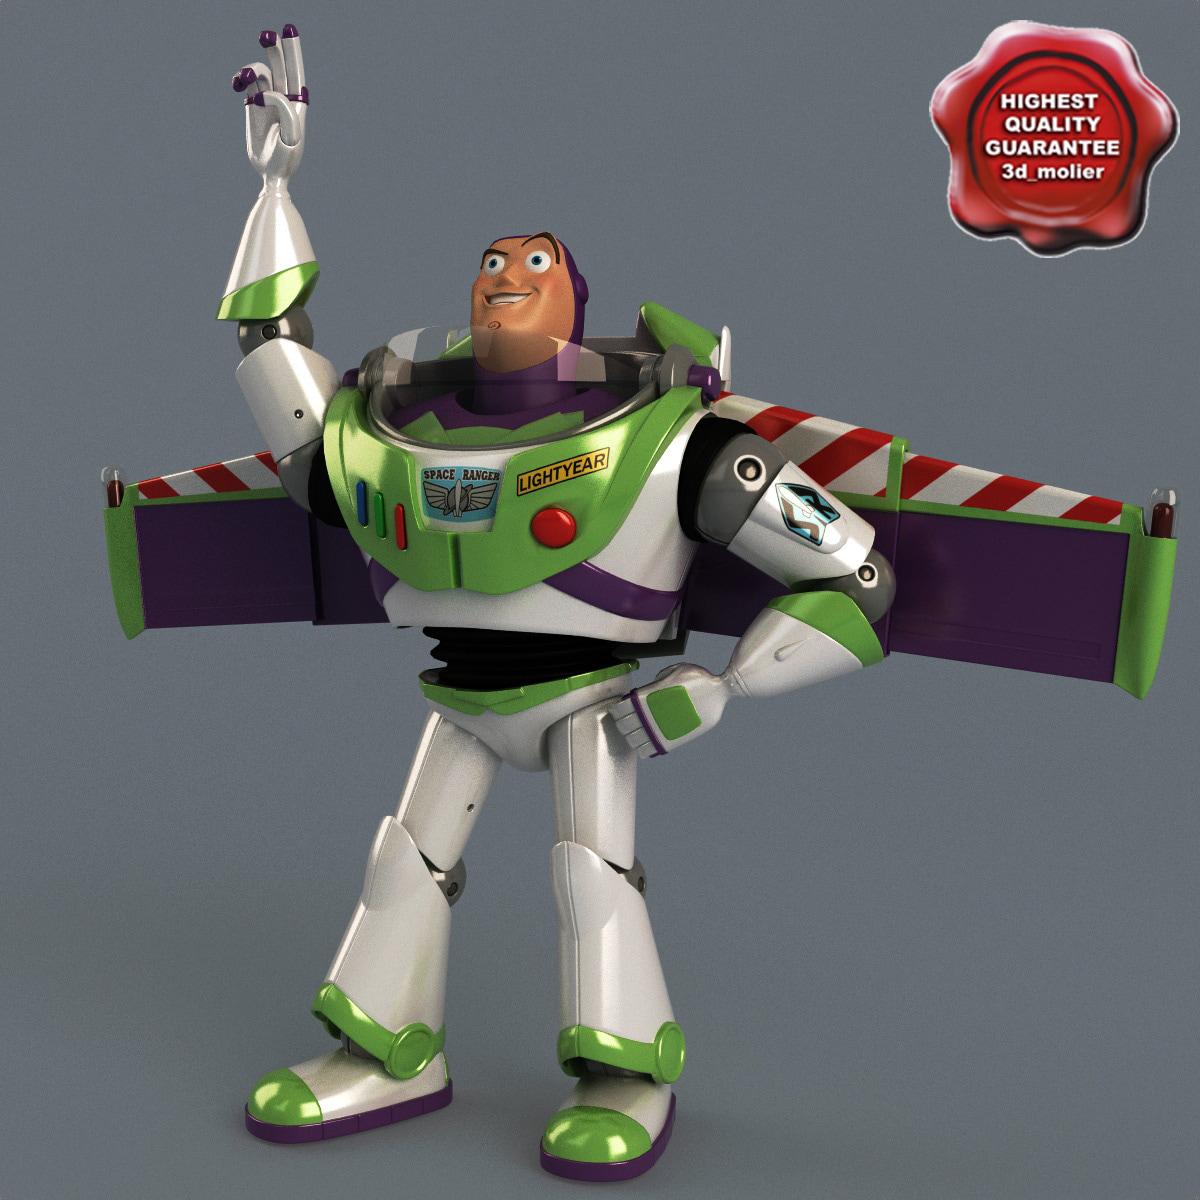 Buzz Lightyear Pose 3